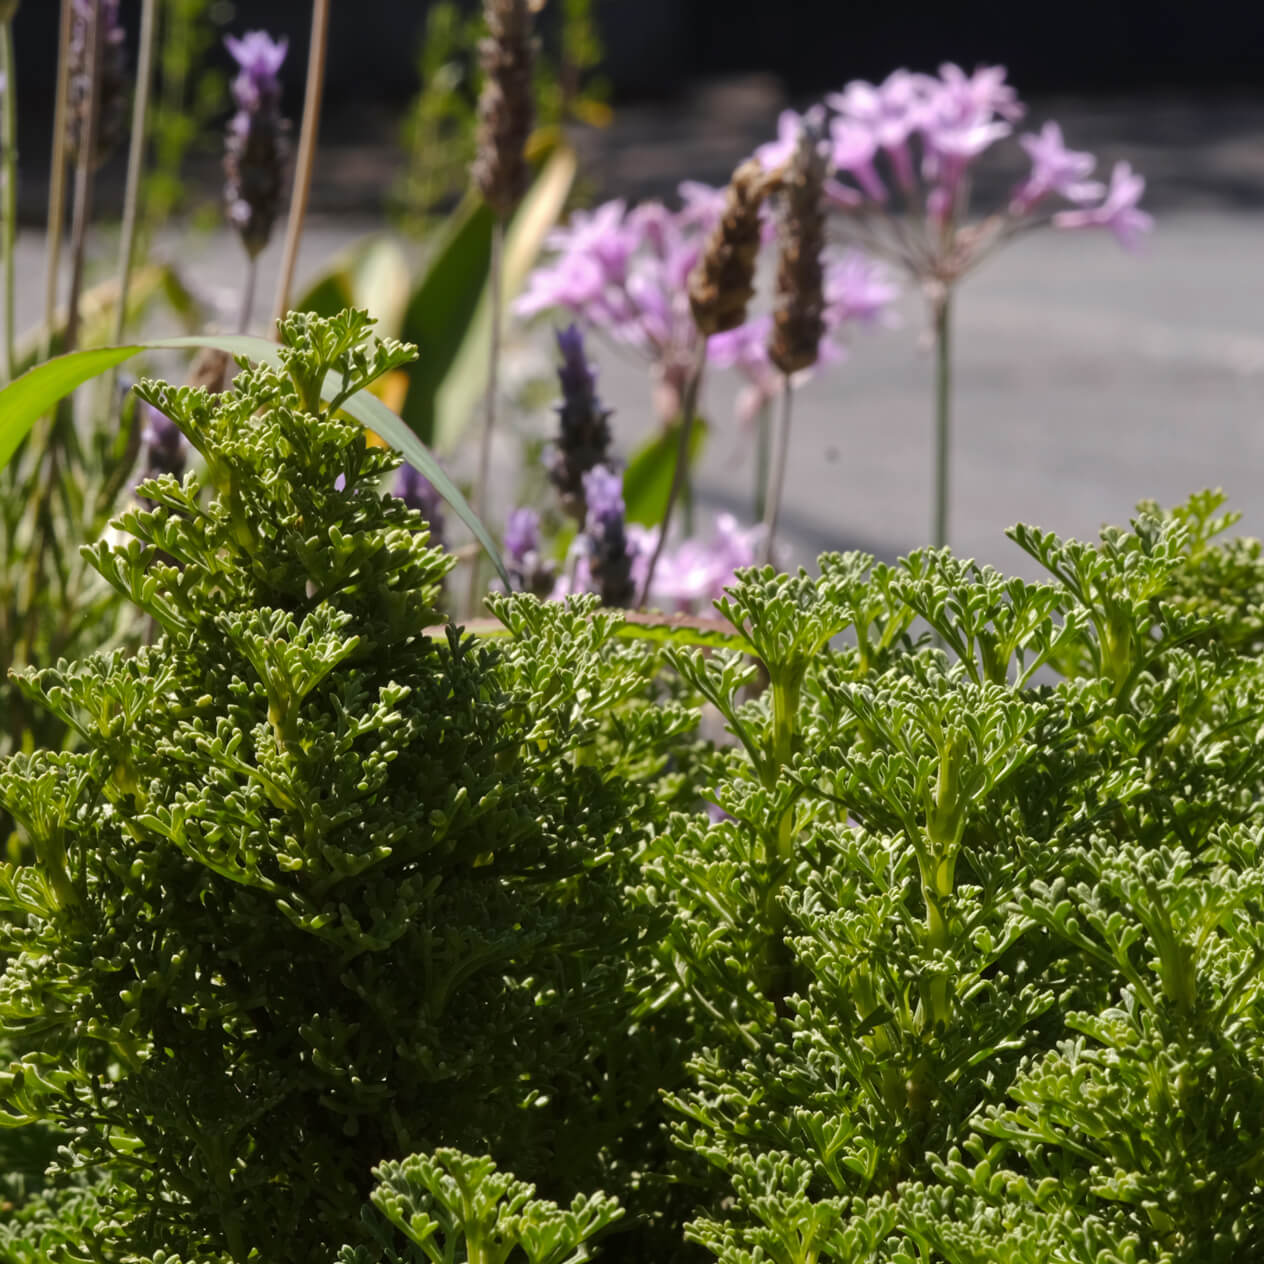 planta-nativa-chile-tallotaller-